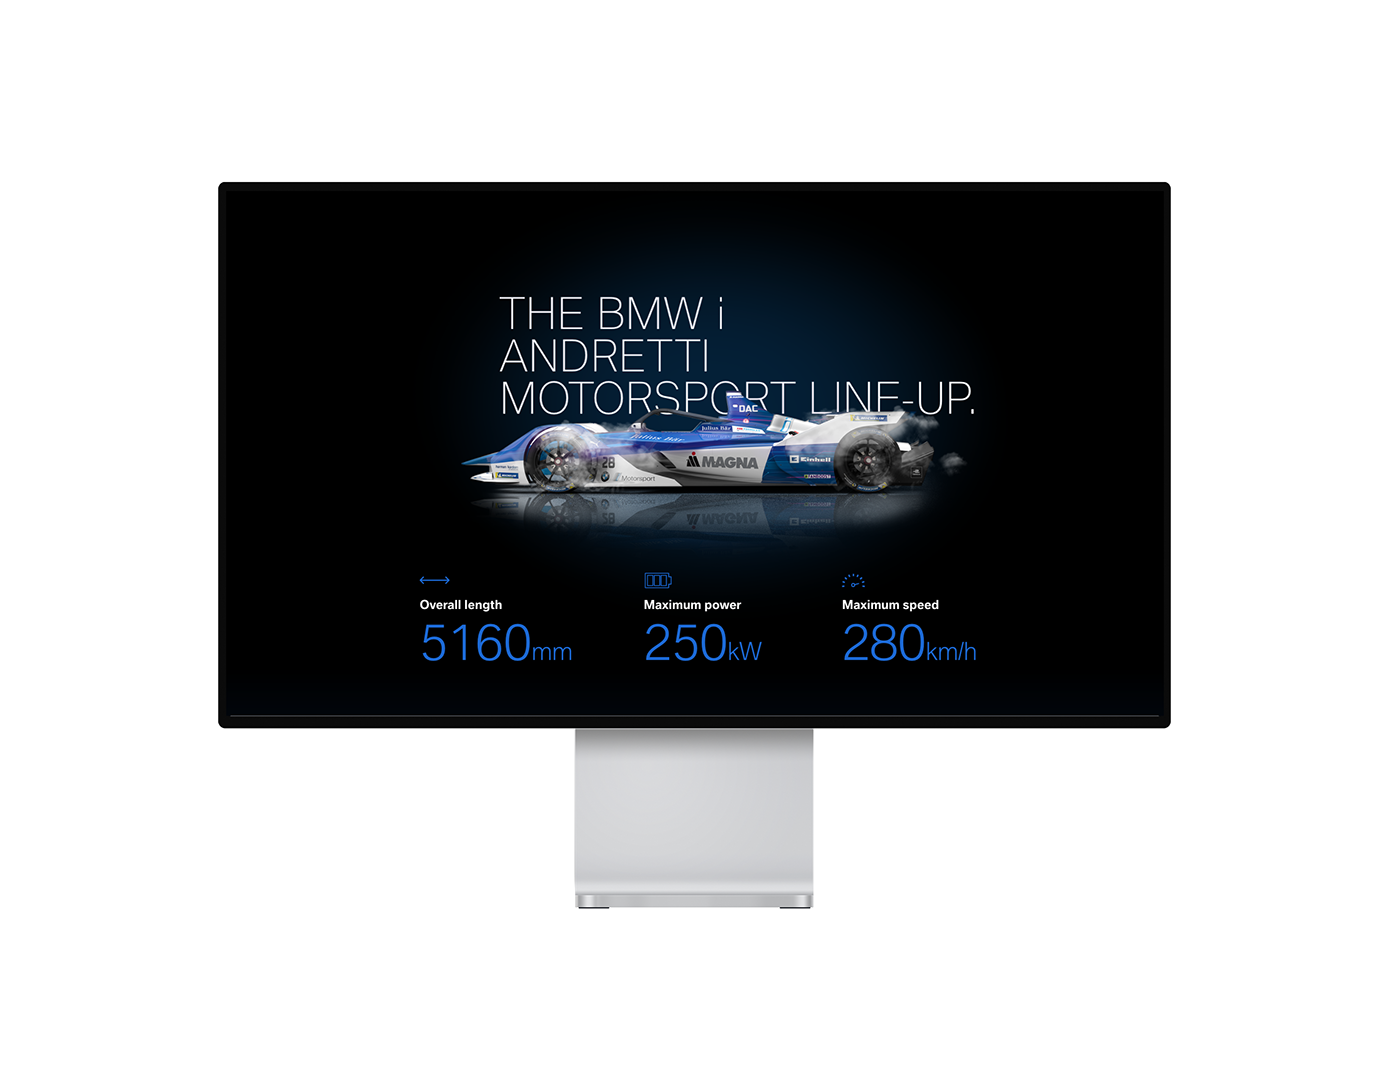 app BENCHMARK BMWi bookingtool design Experience Formulae video